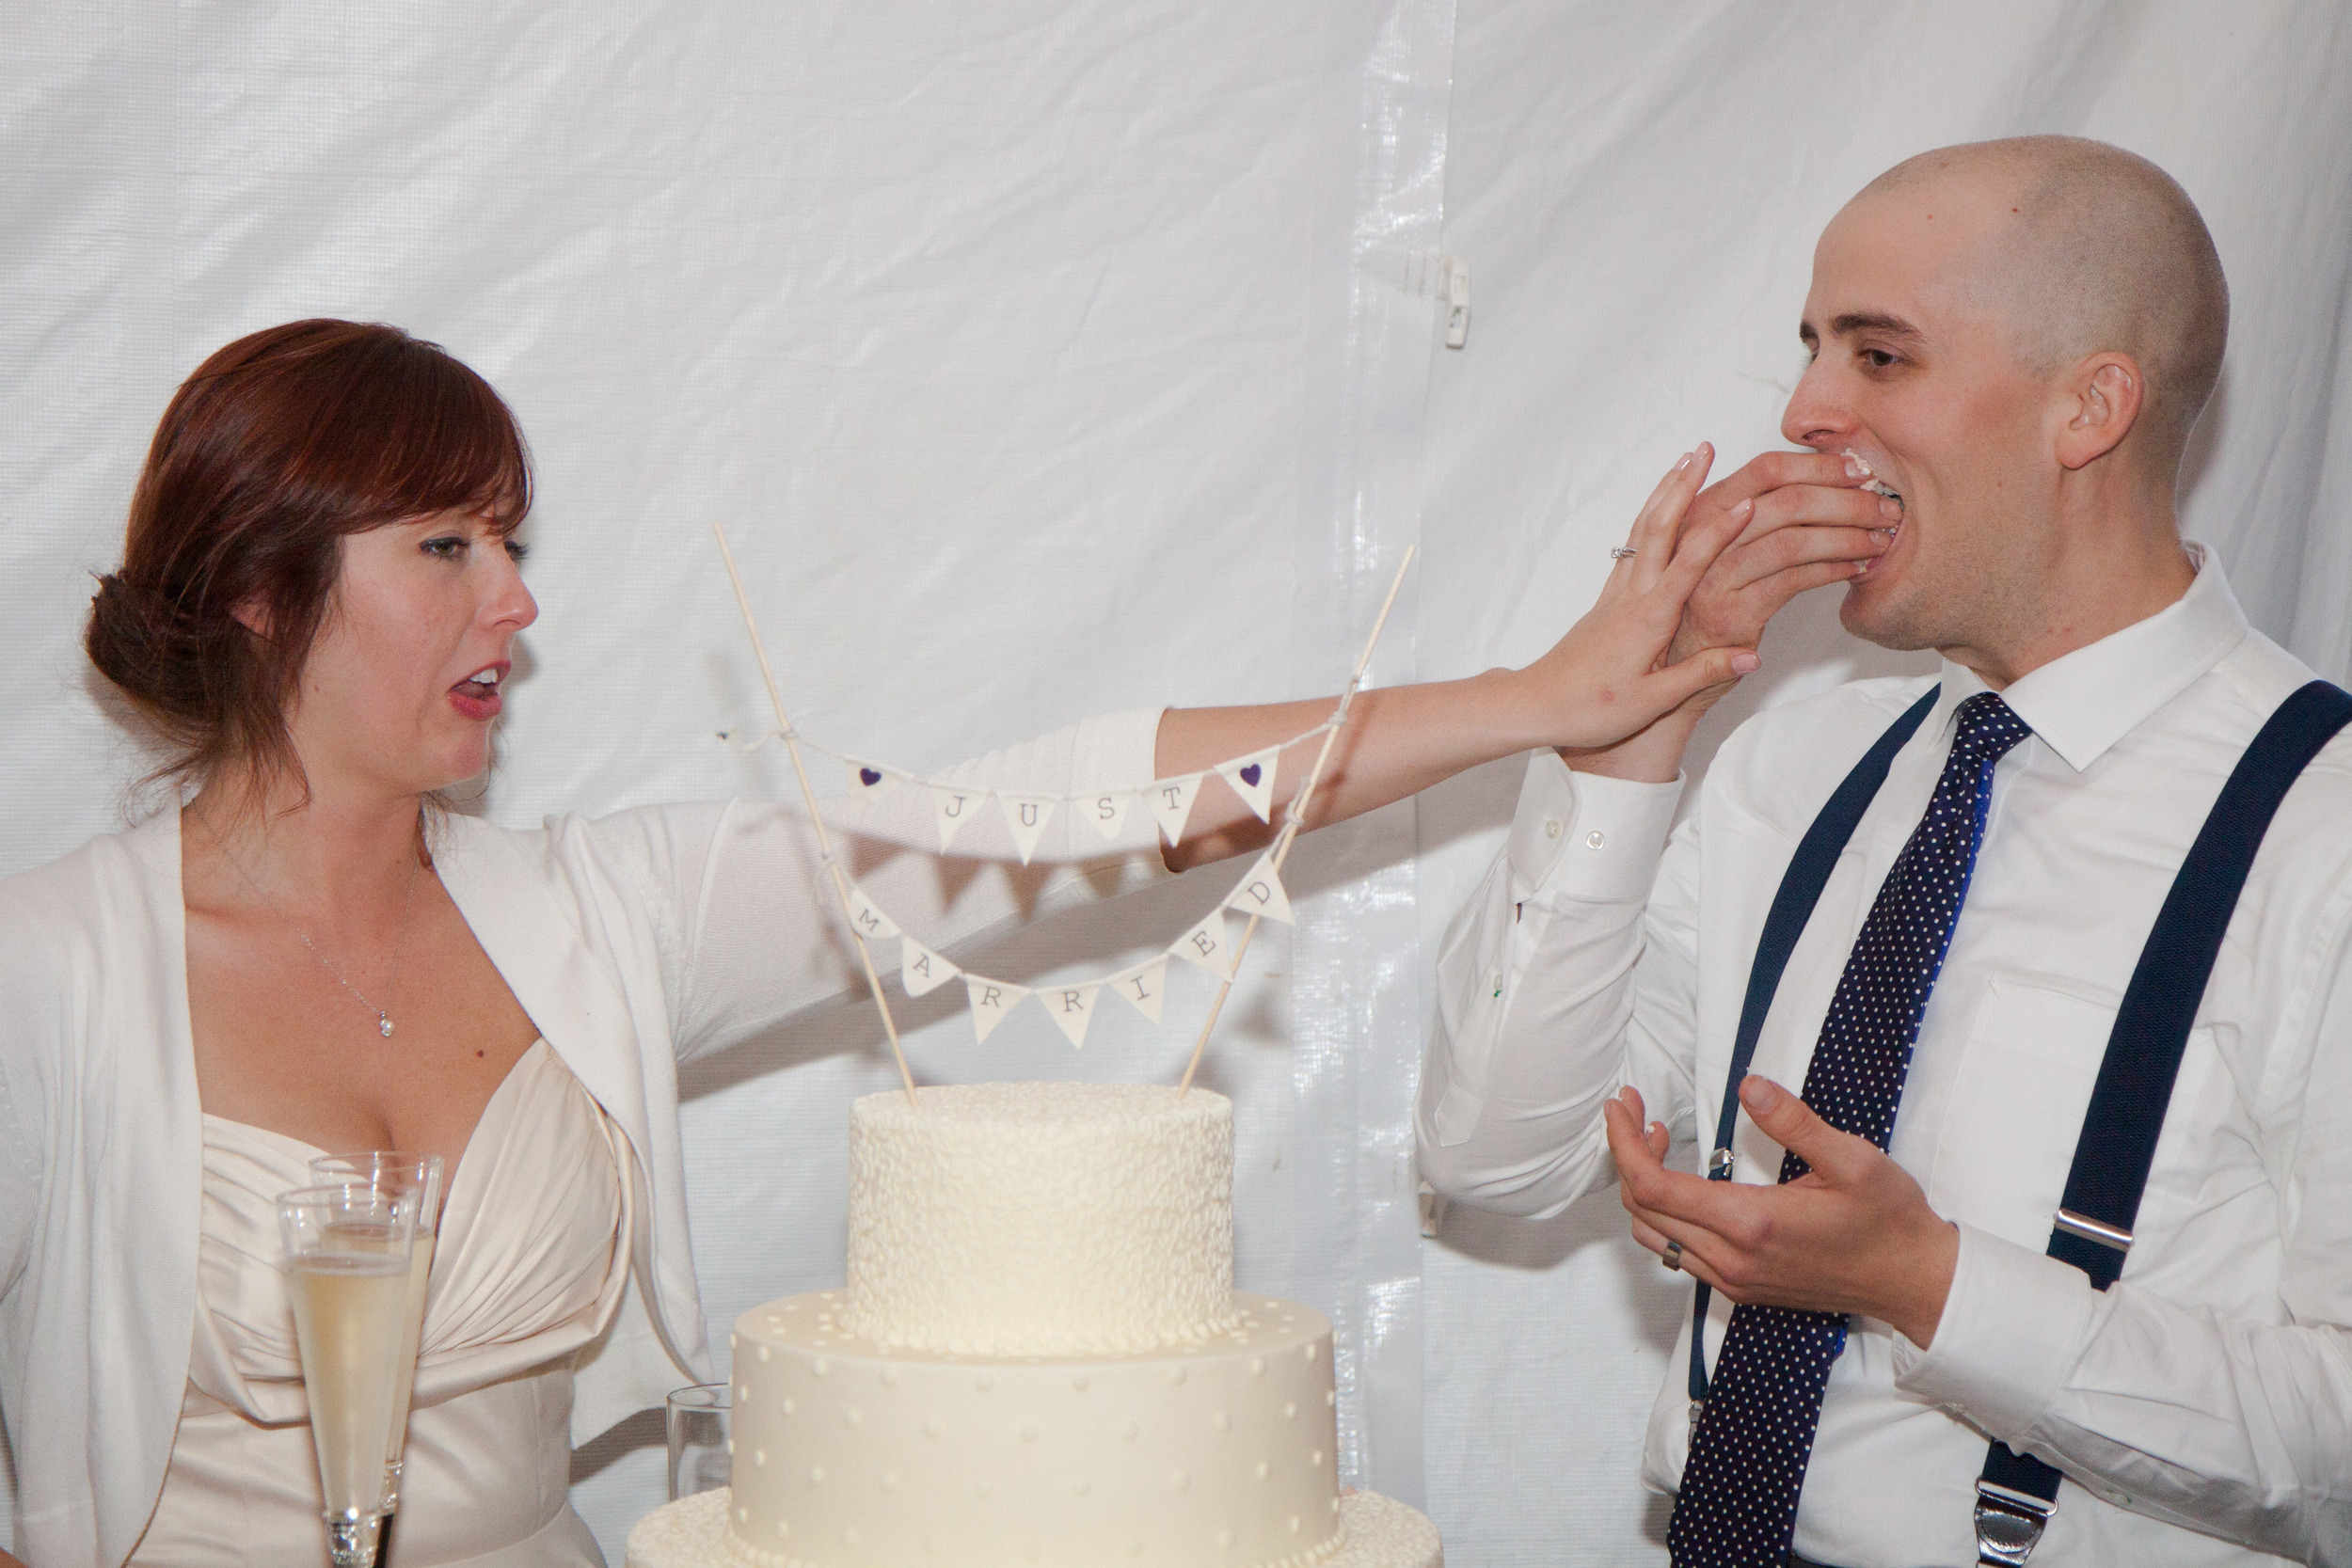 Wilson Bickel Wedding - Reception and Ceremony (363 of 526).jpg